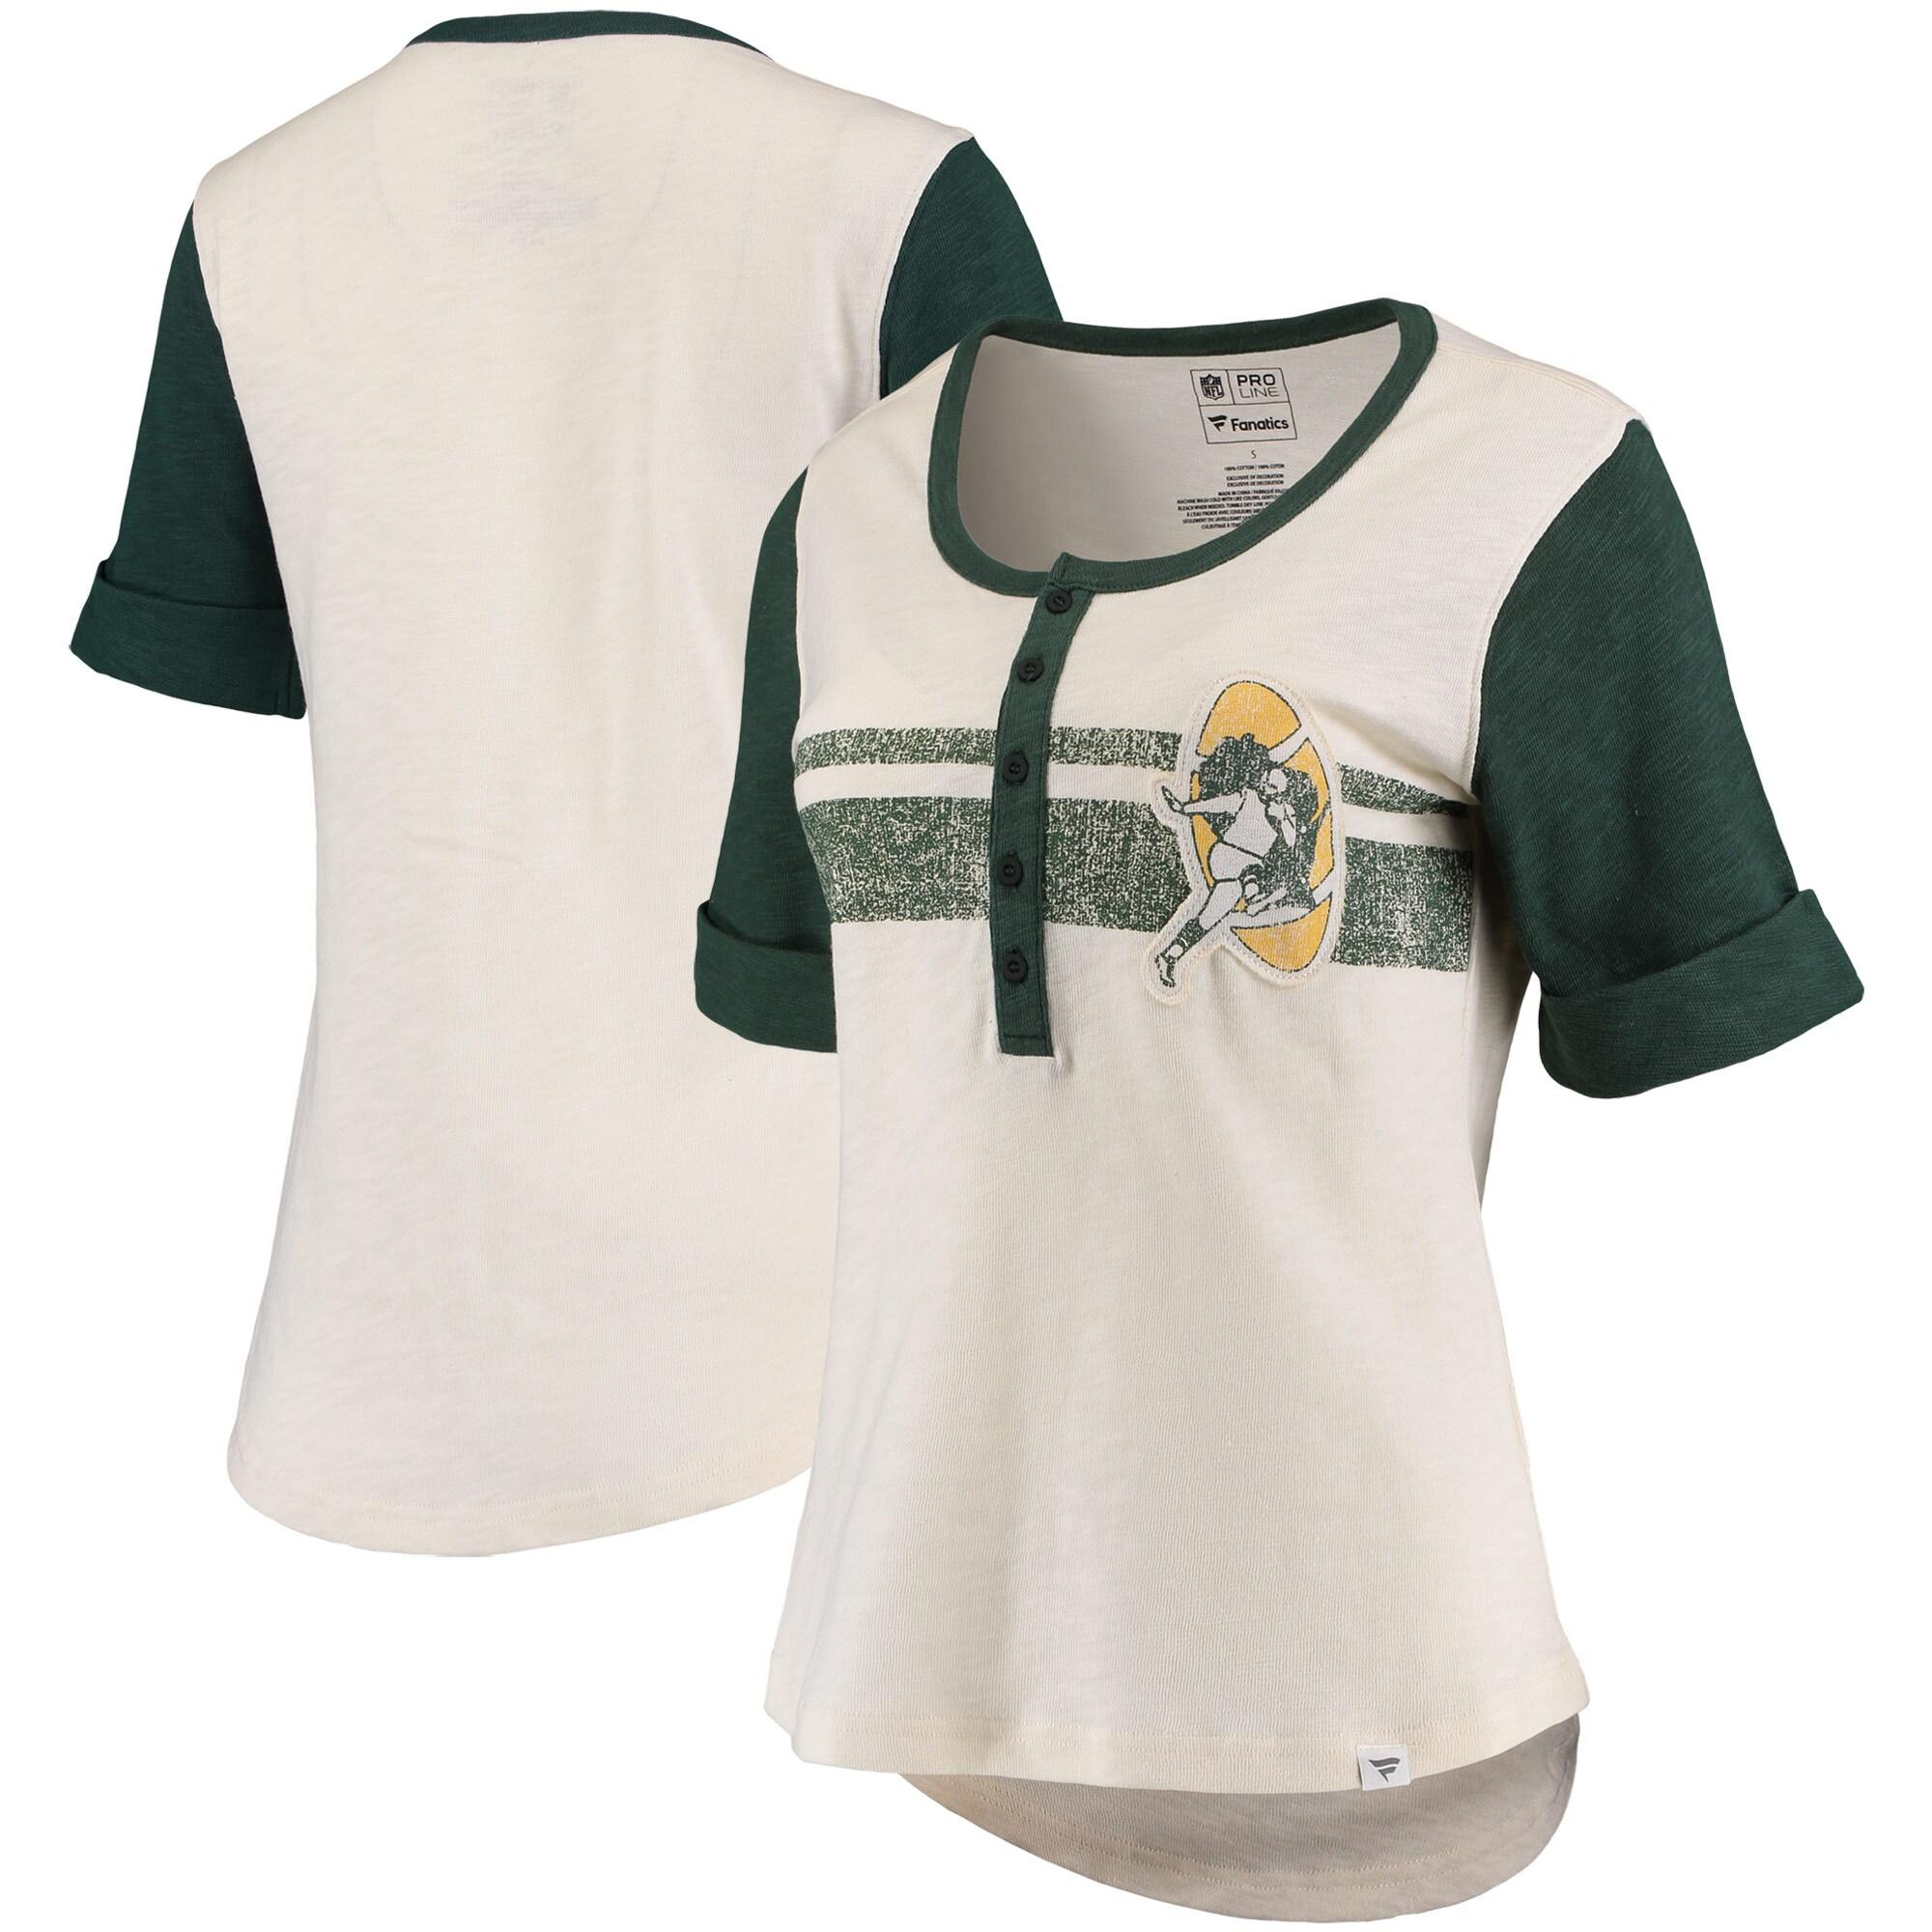 Green Bay Packers Fanatics Branded Women's True Classics Drop Tail Henley T-Shirt - White/Green